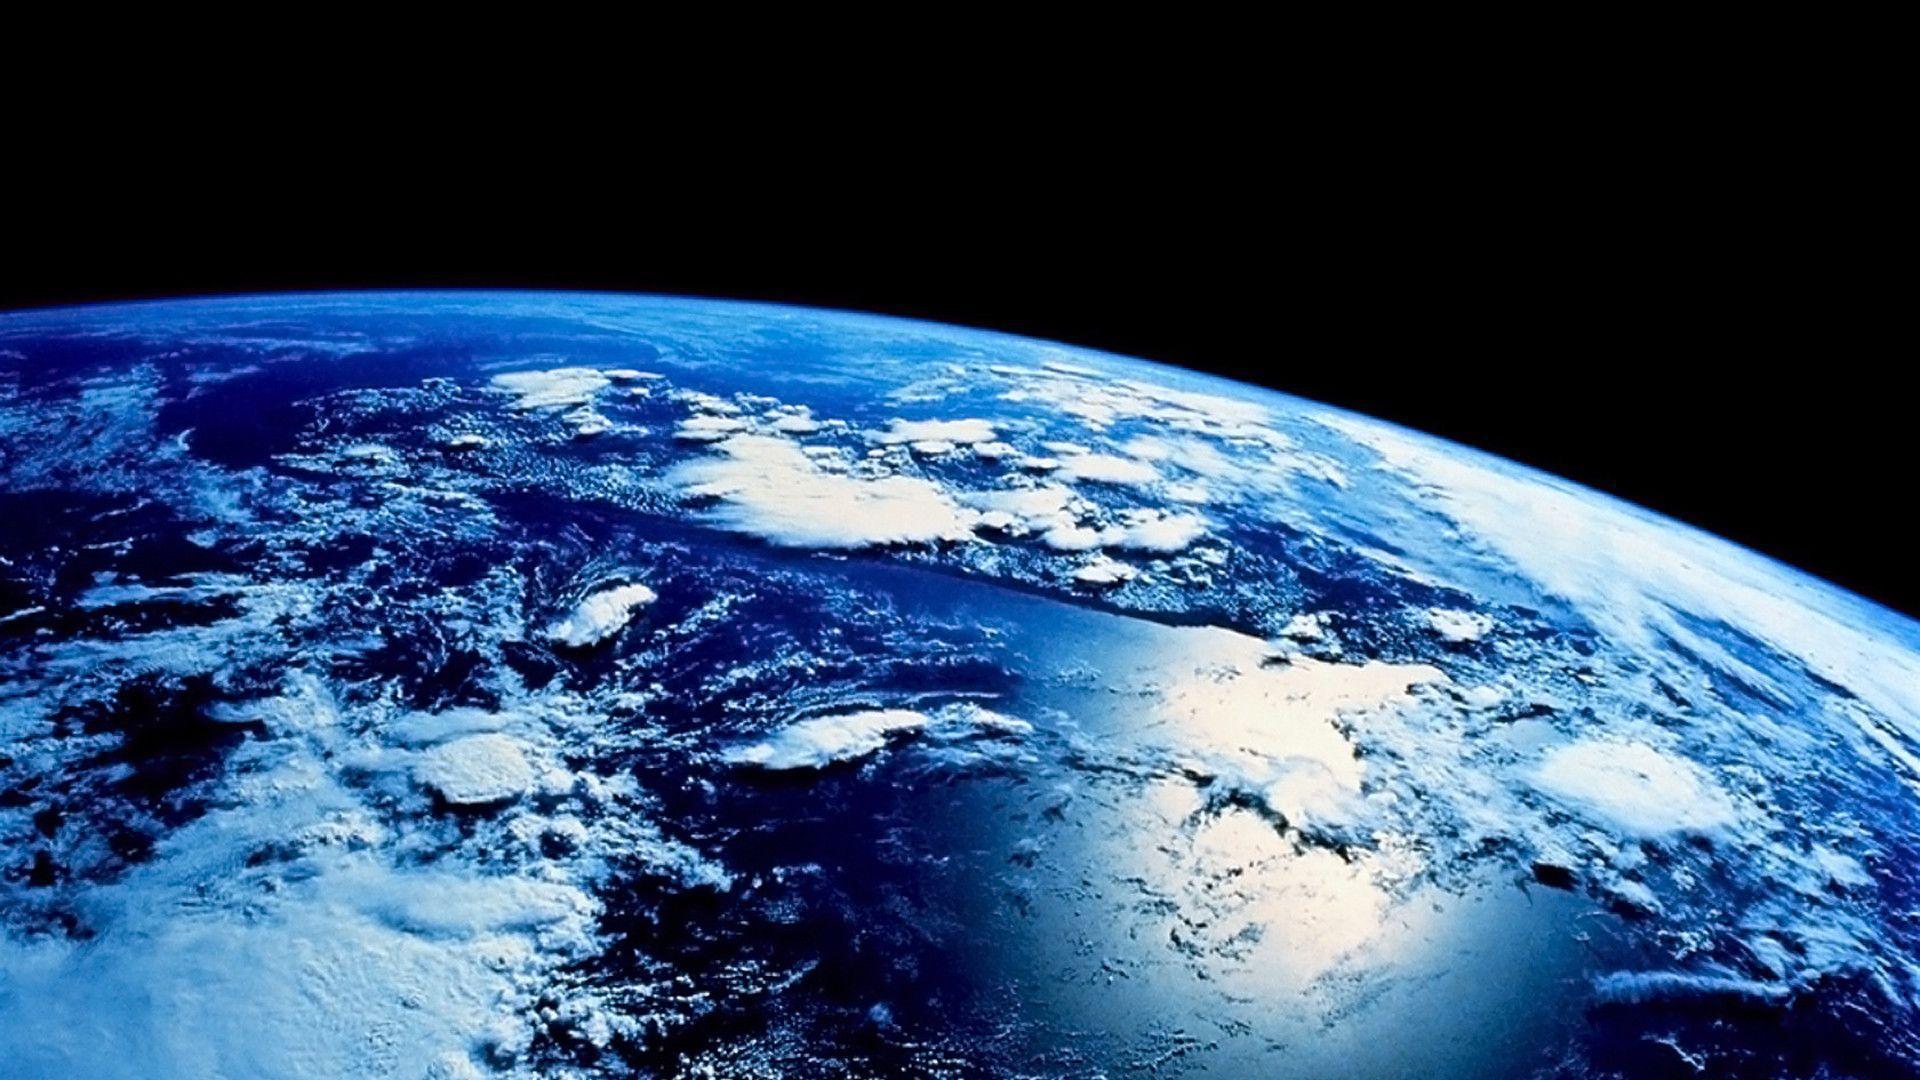 Earth Desktop Backgrounds Wallpaper Cave